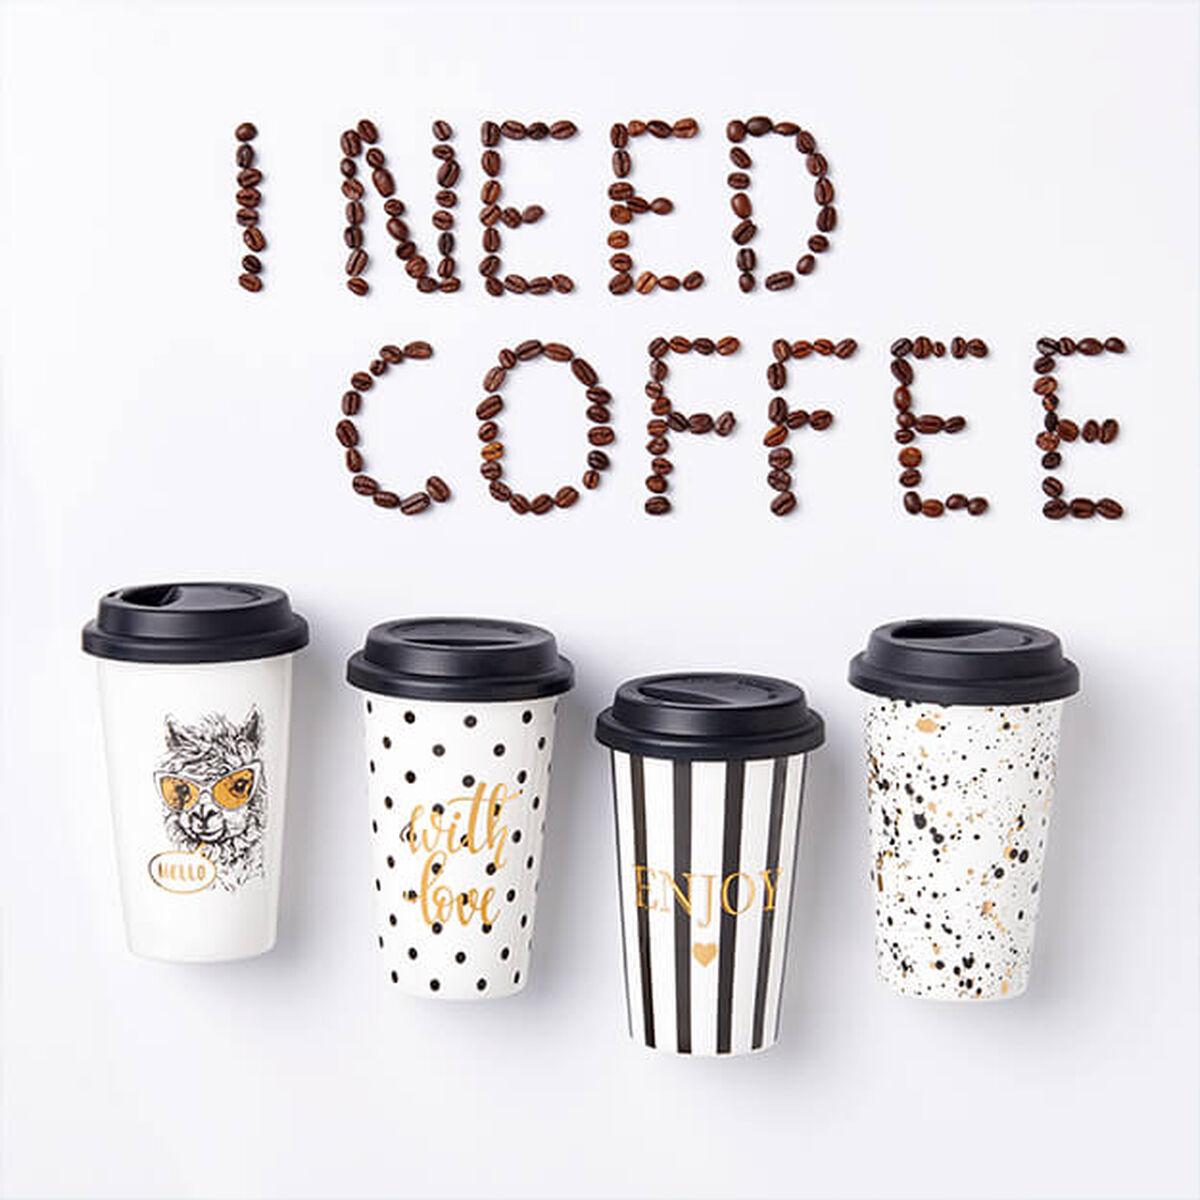 kaffeetassen kaffeebecher online kaufen butlers. Black Bedroom Furniture Sets. Home Design Ideas